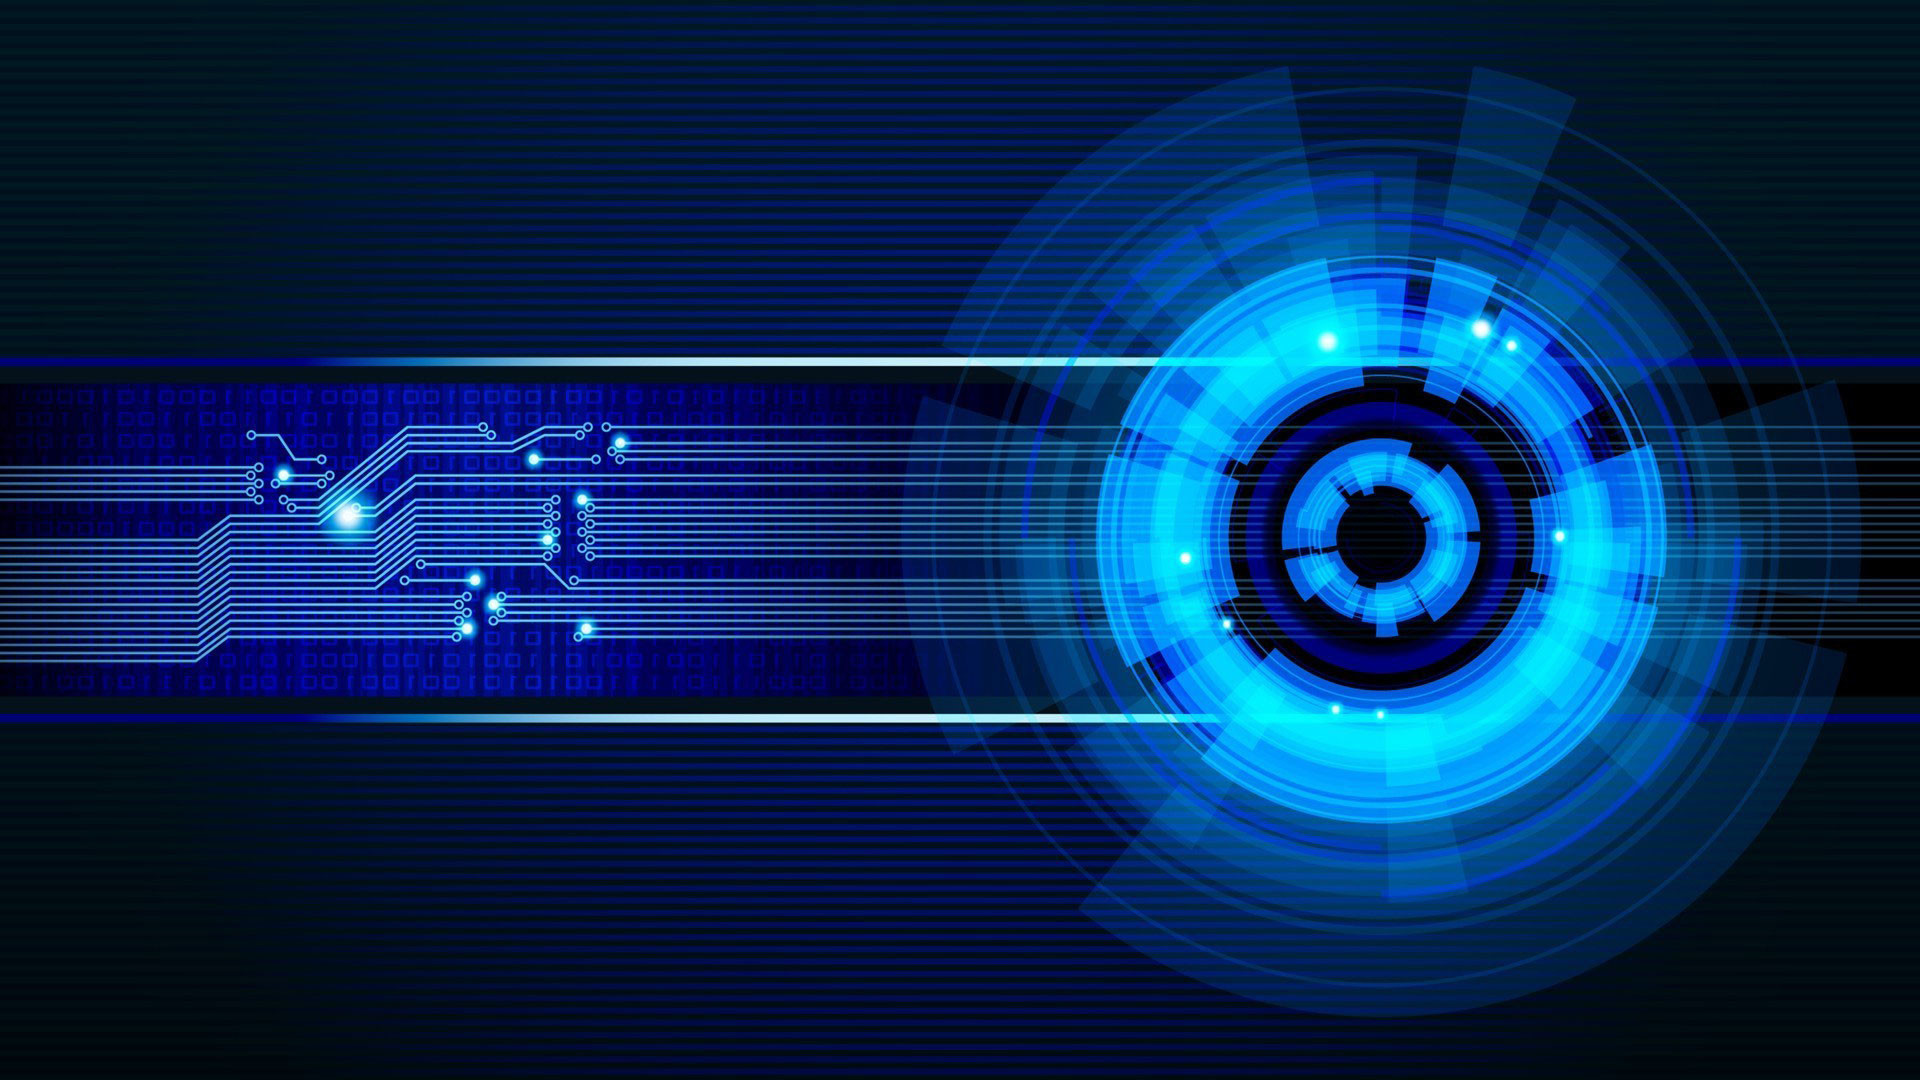 hd pics photos blue circuit digital technology desktop background wallpaper